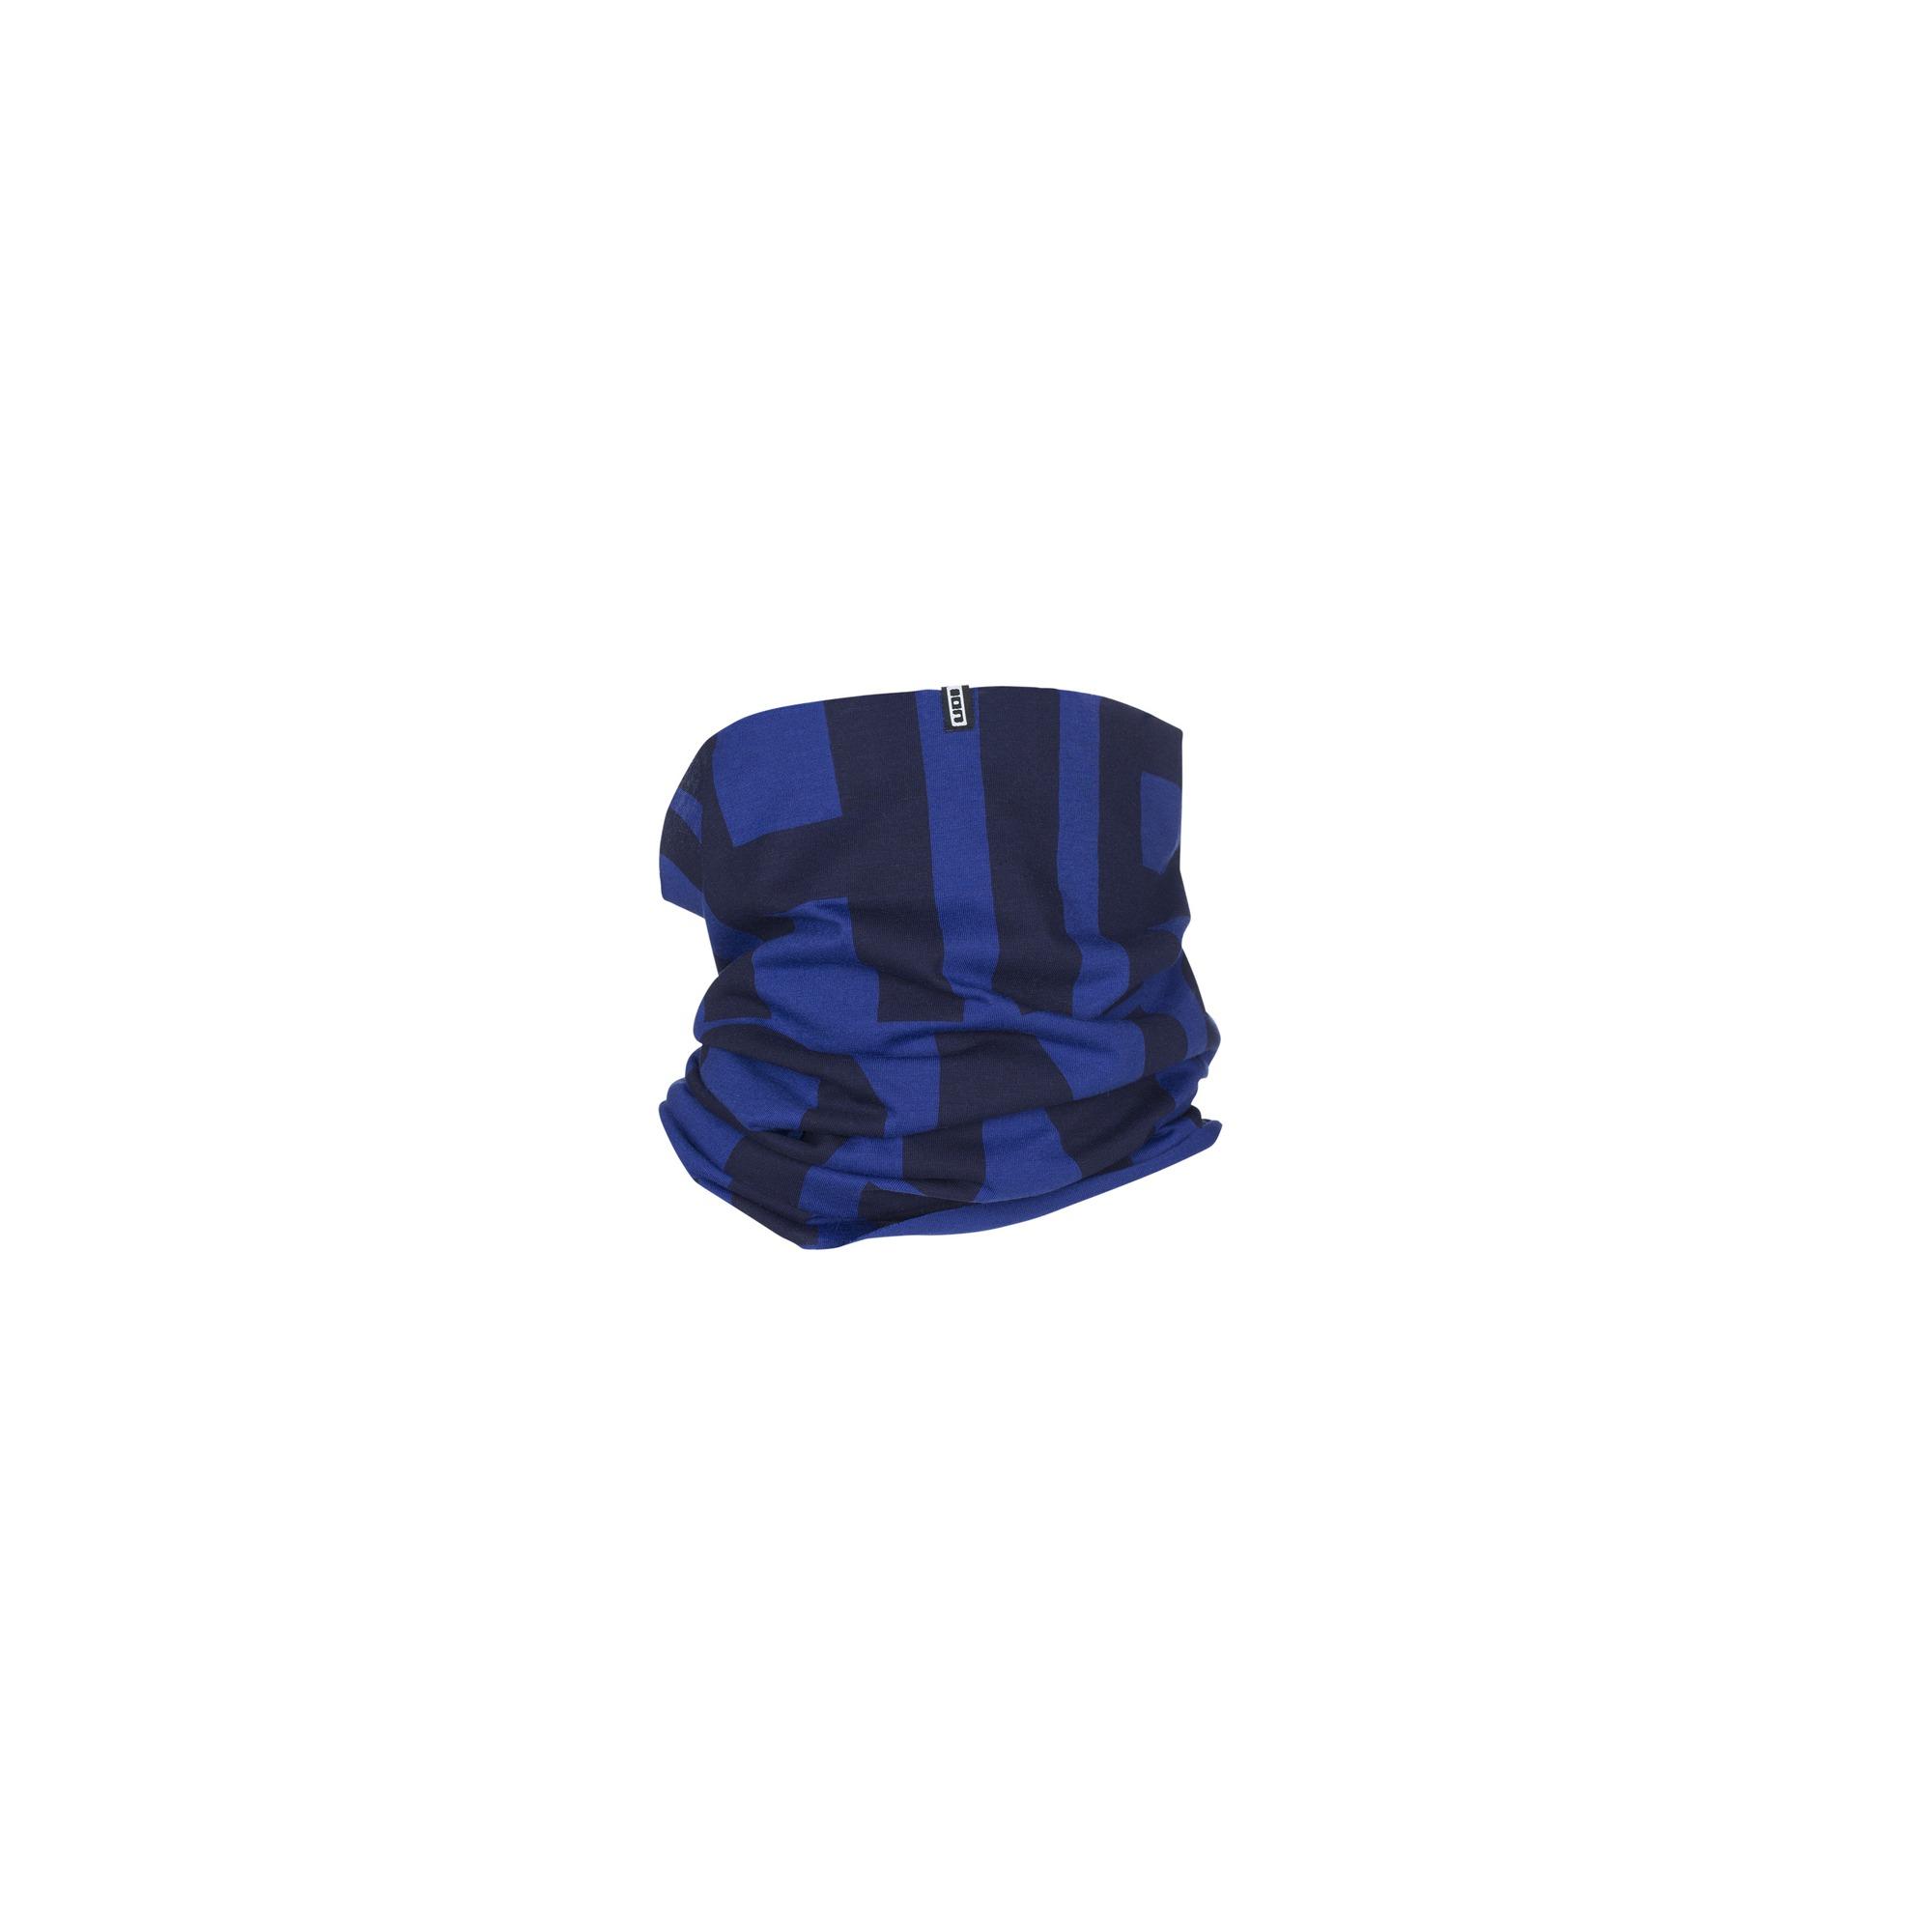 Neckwarmer, Bandana, Headwear, Balaclava, Hals- und Nackenwärmer, Maske, Haarband